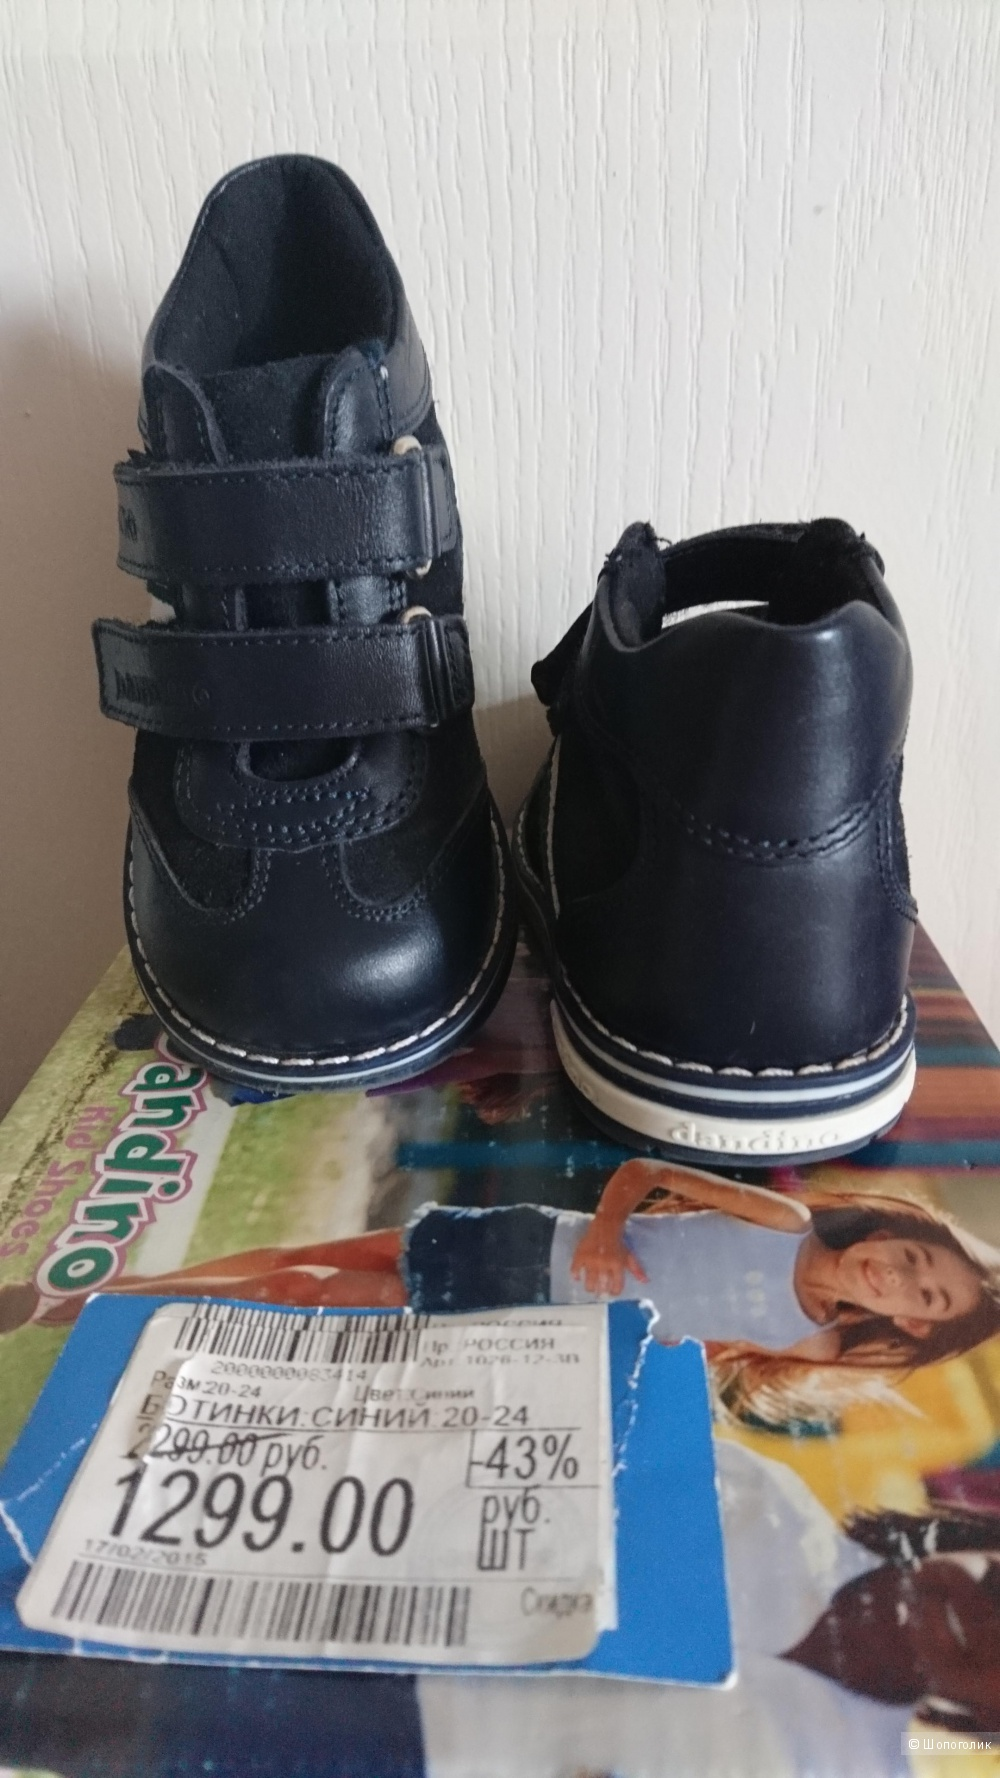 Детские ботиночки DANDINO, 100 %кожа, размер 21